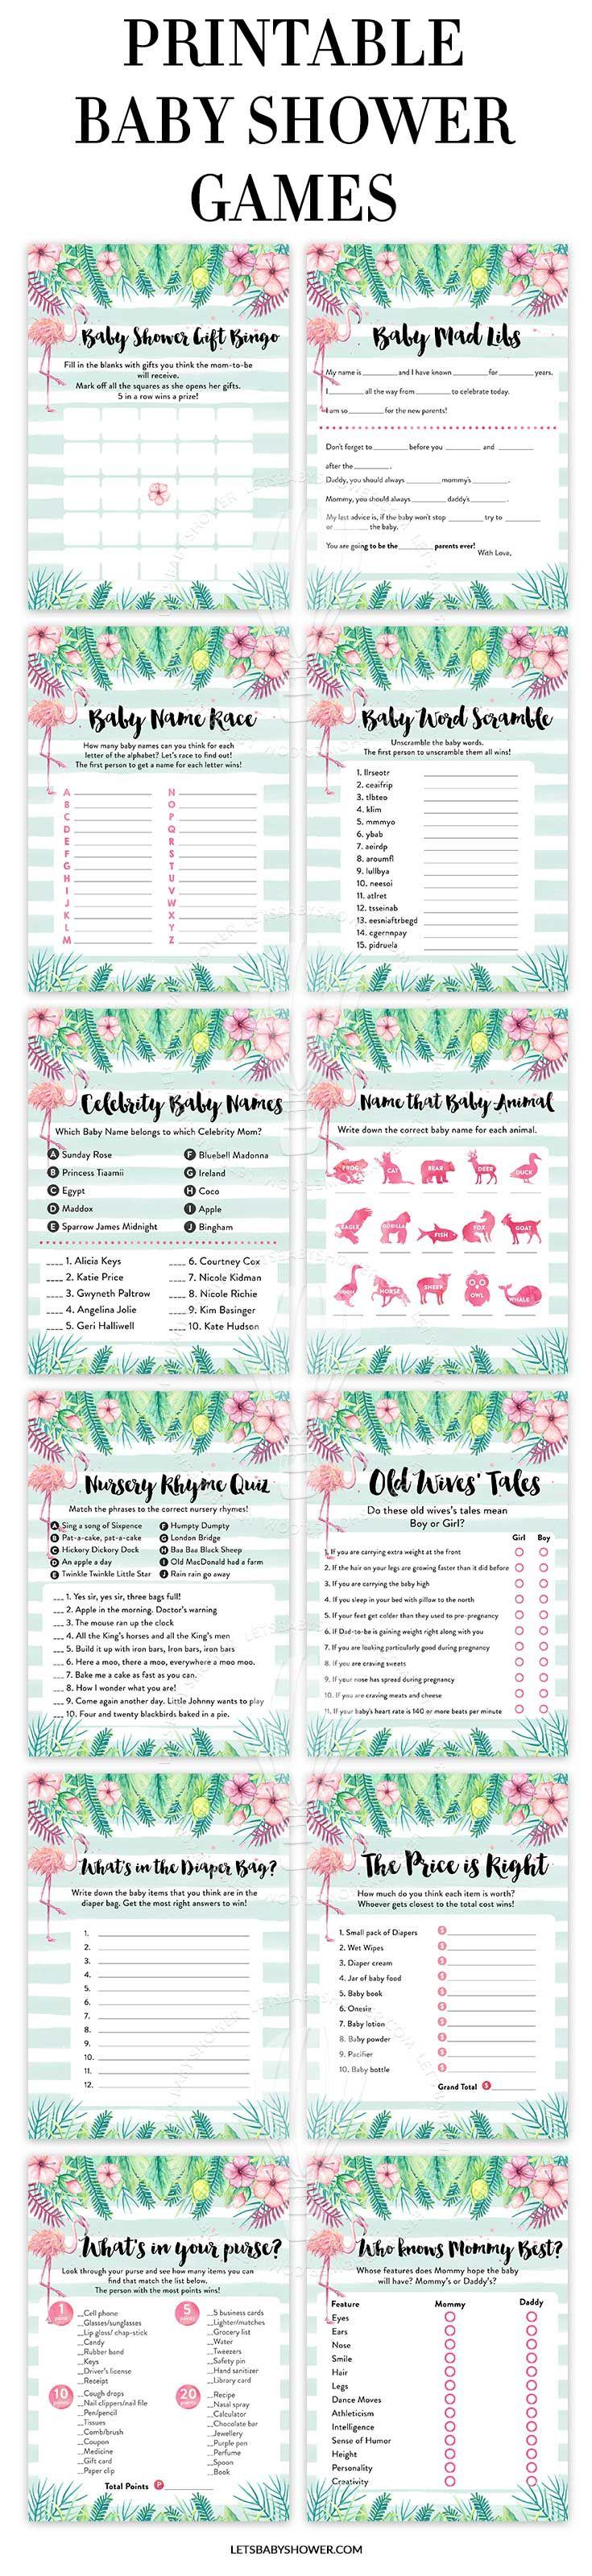 Best Baby games for girls ideas on Pinterest